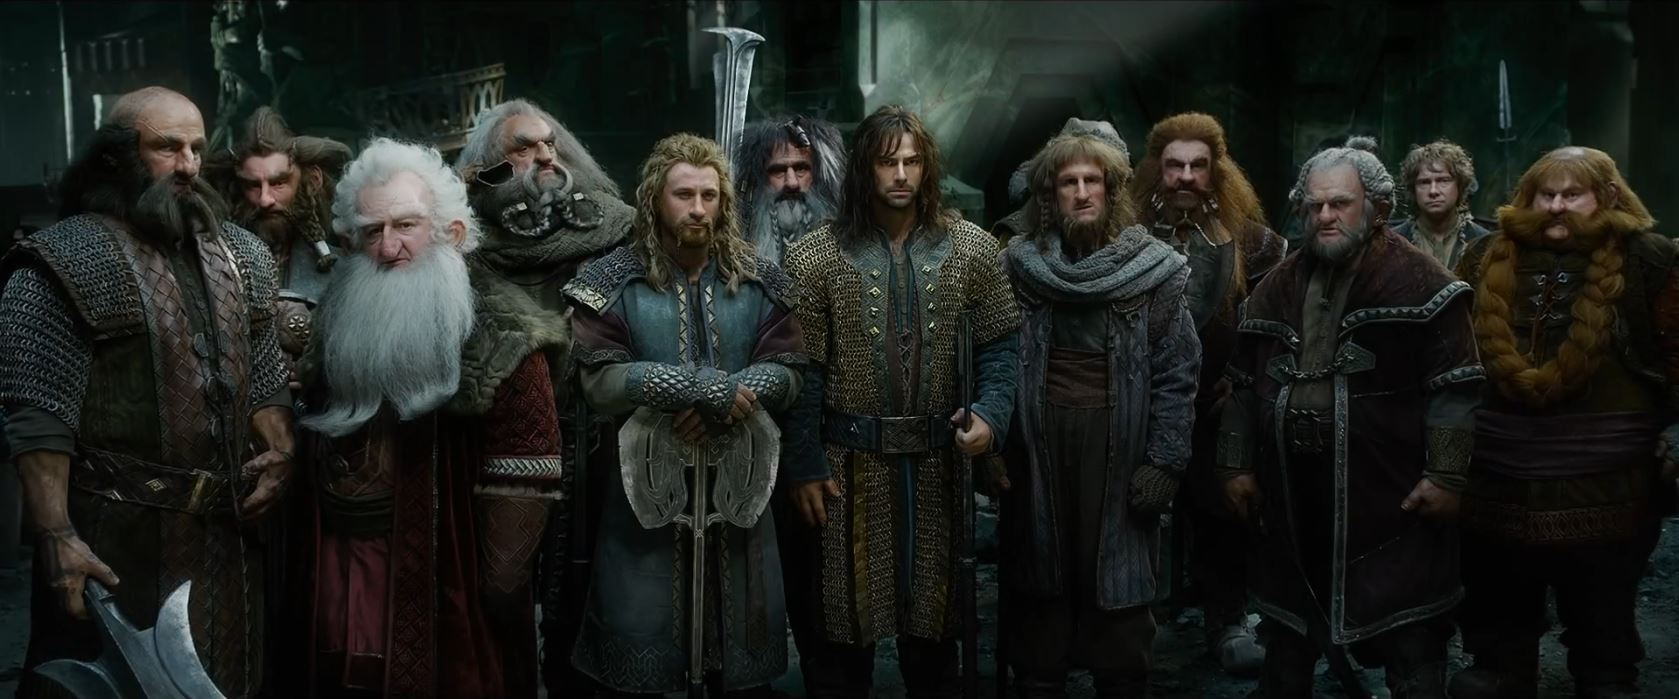 The Hobbit The Battle of the Five Armies Trailer - The Hobbit Dwarve company